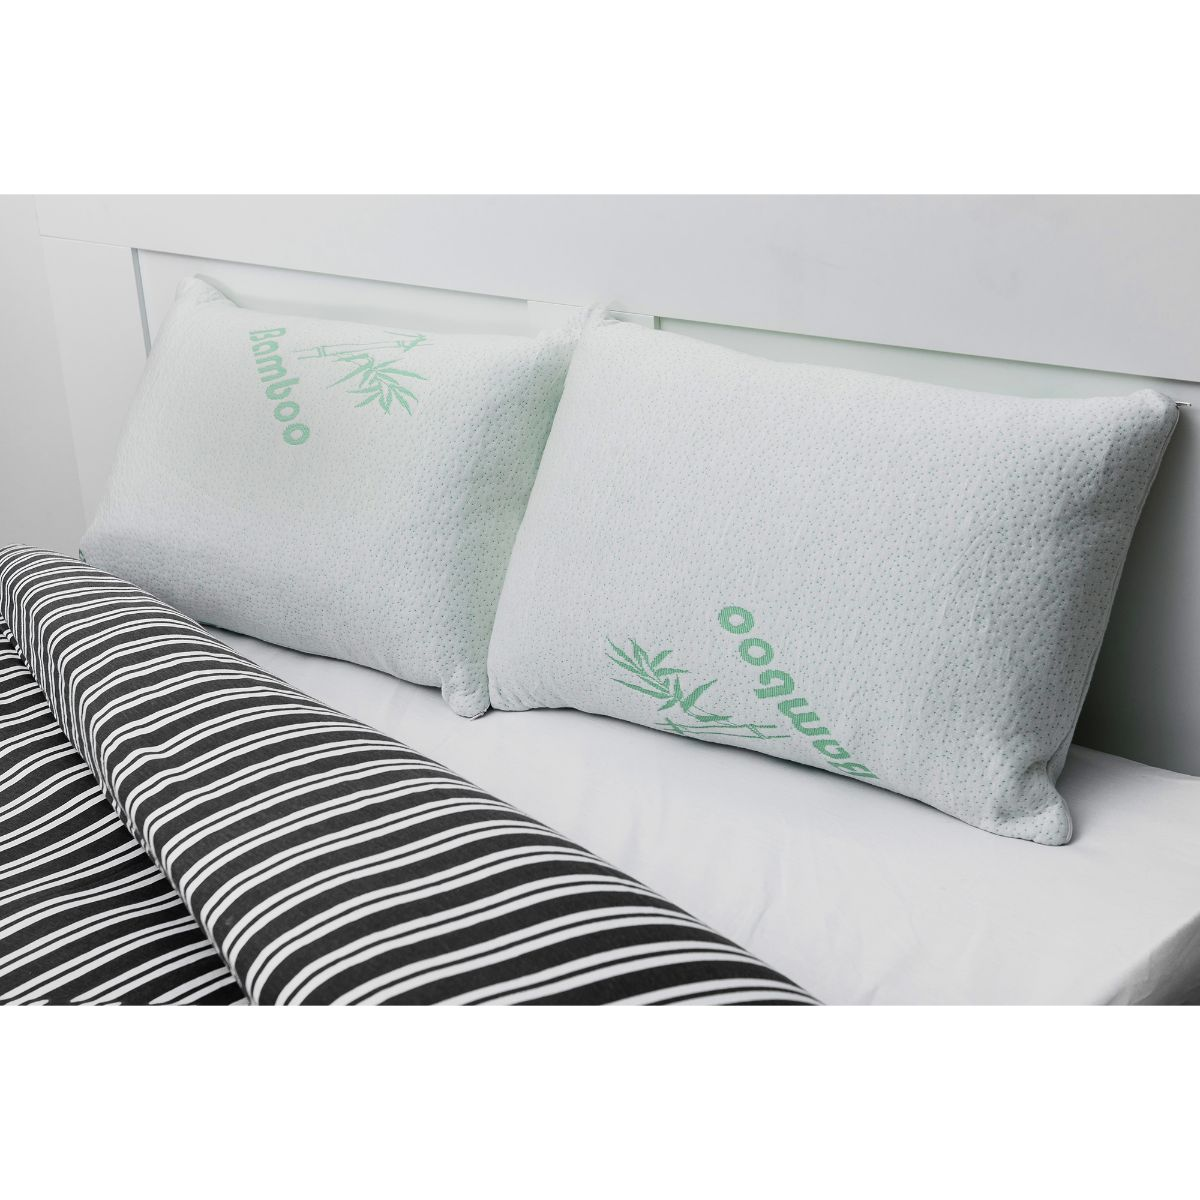 New Bamboo Memory Foam Pillow Premium Support Pillow Luxury Anti-Bacterial UK